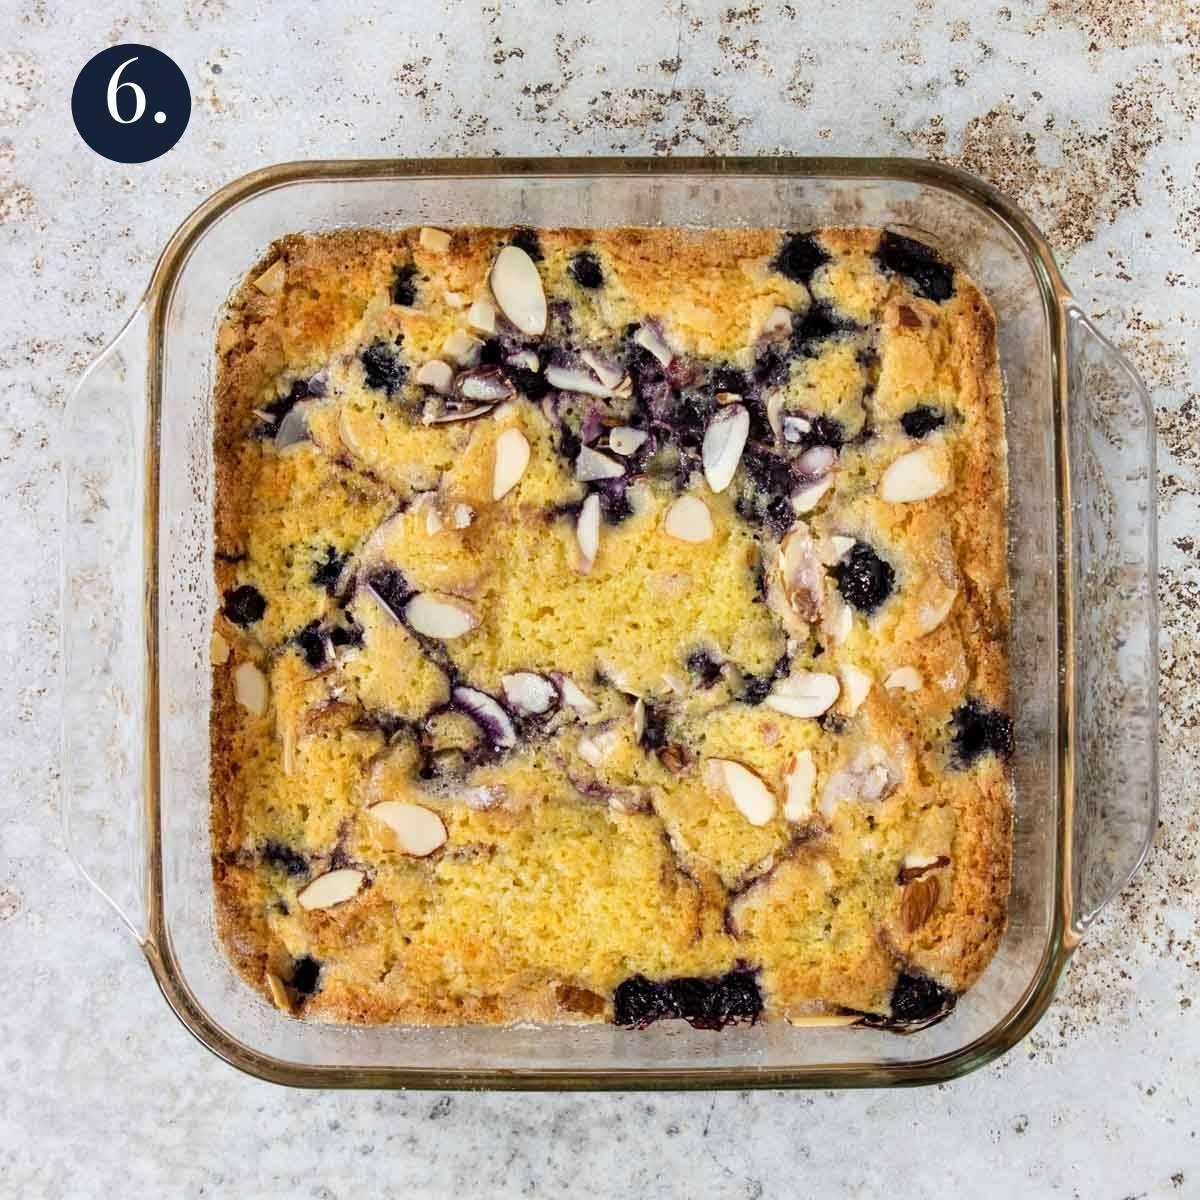 blueberry breakfast cake in a glass baking pan